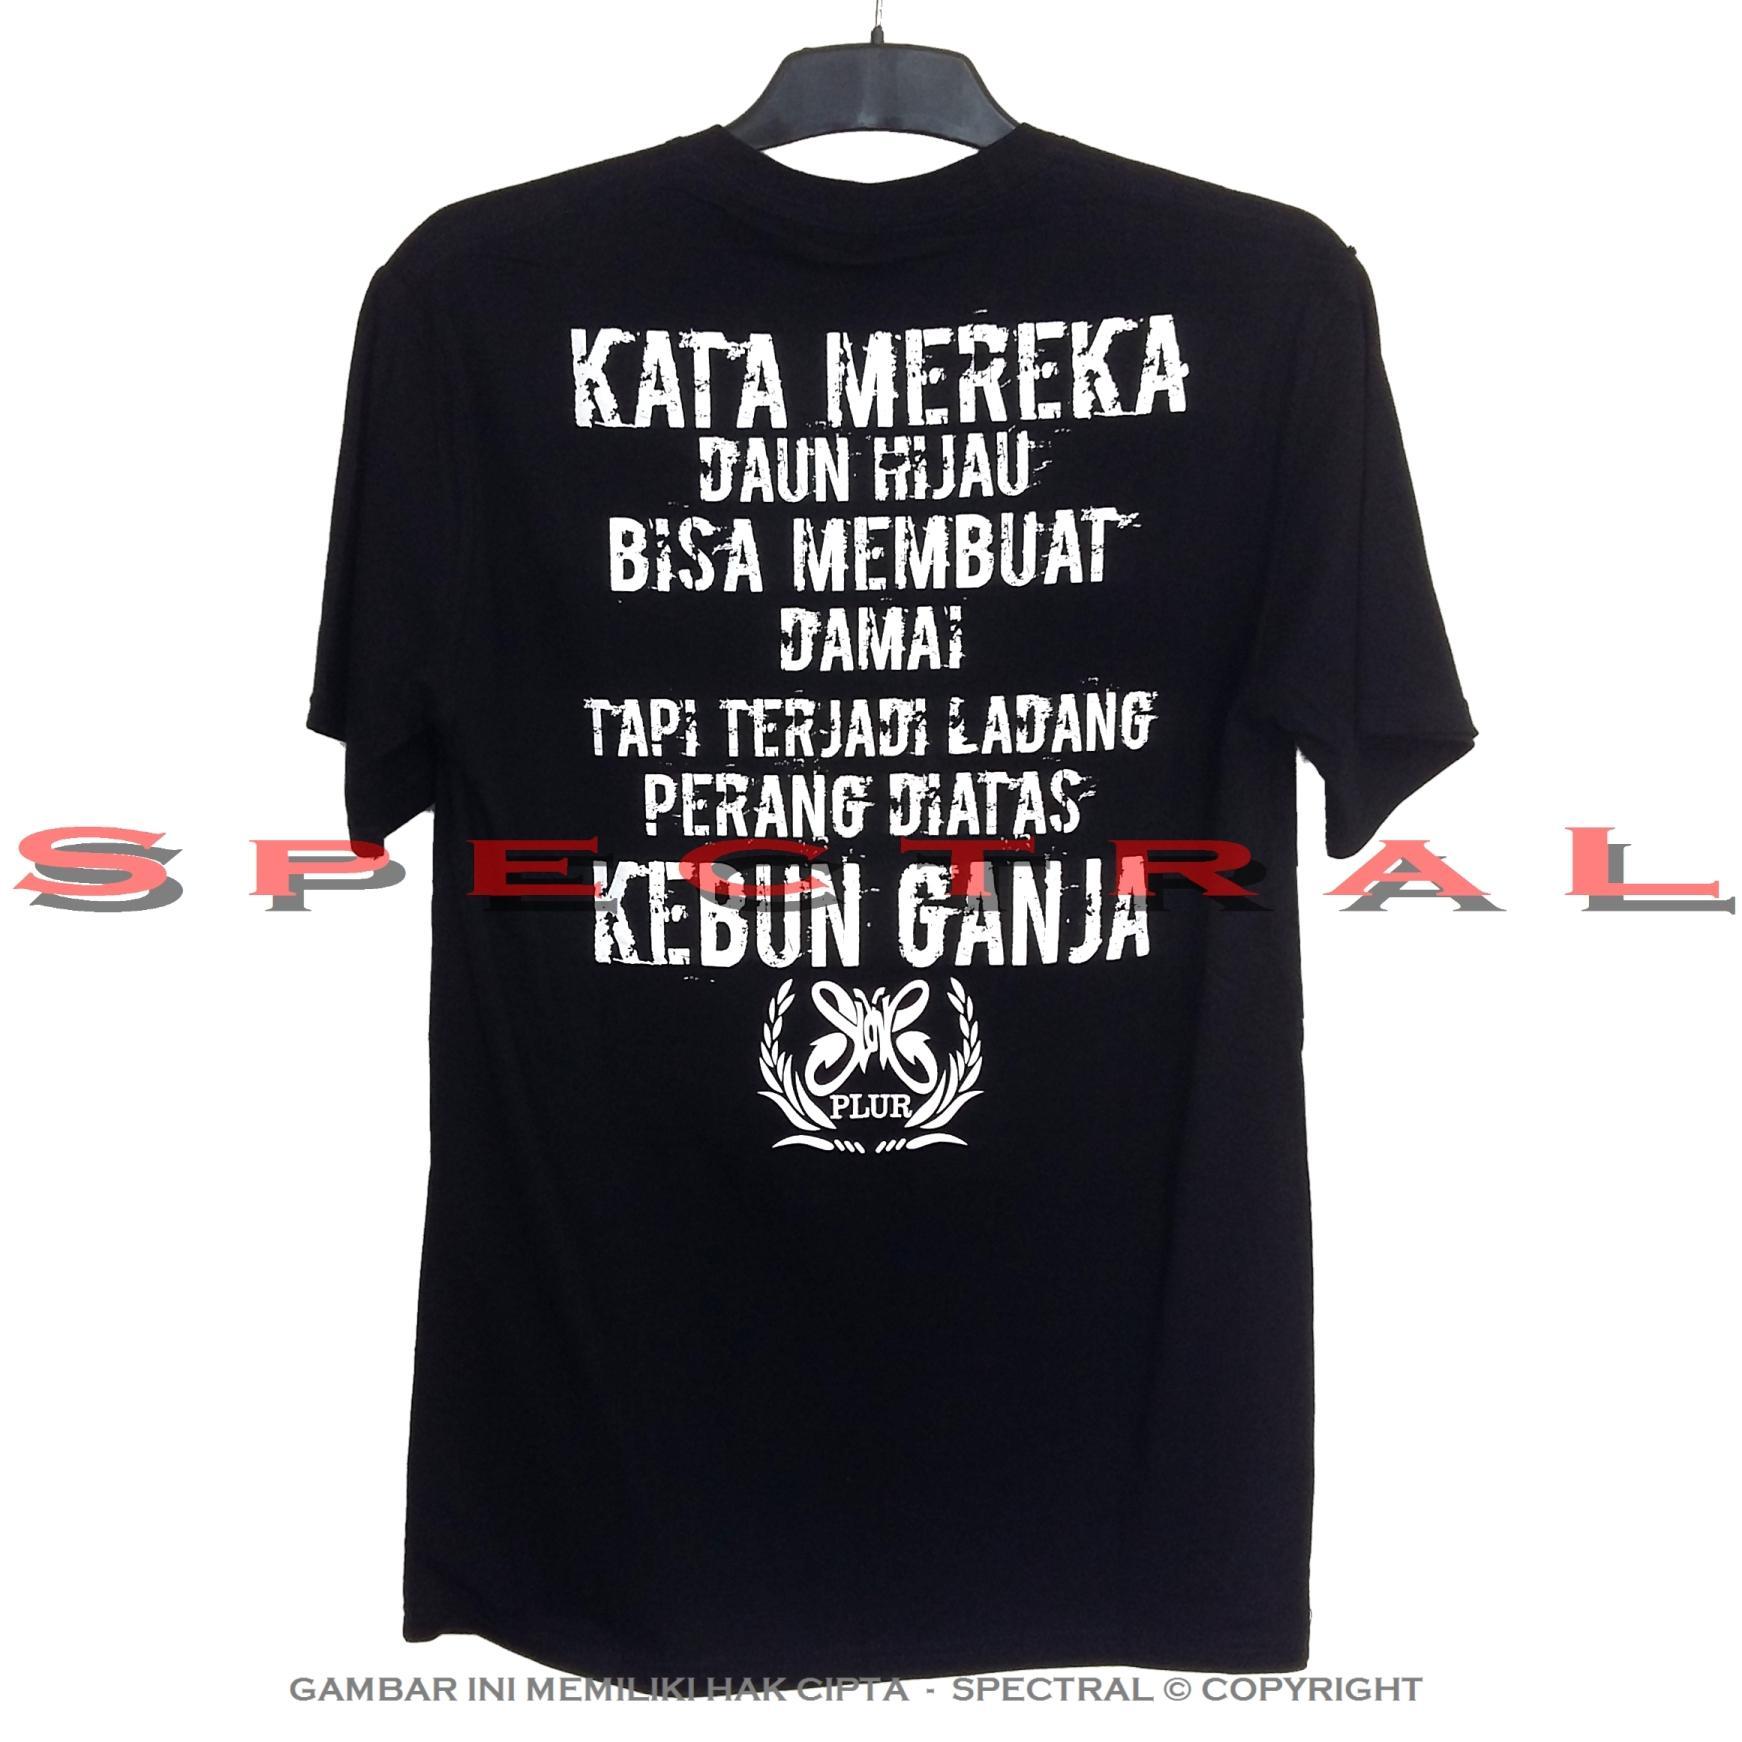 Detail Gambar Spectral - Slank 100% Soft Cotton Combed 30s Kaos Distro Fashion T-Shirt Atasan Oblong Baju Pakaian Polos Shirt Pria Wanita Cewe Cowo Lengan ...